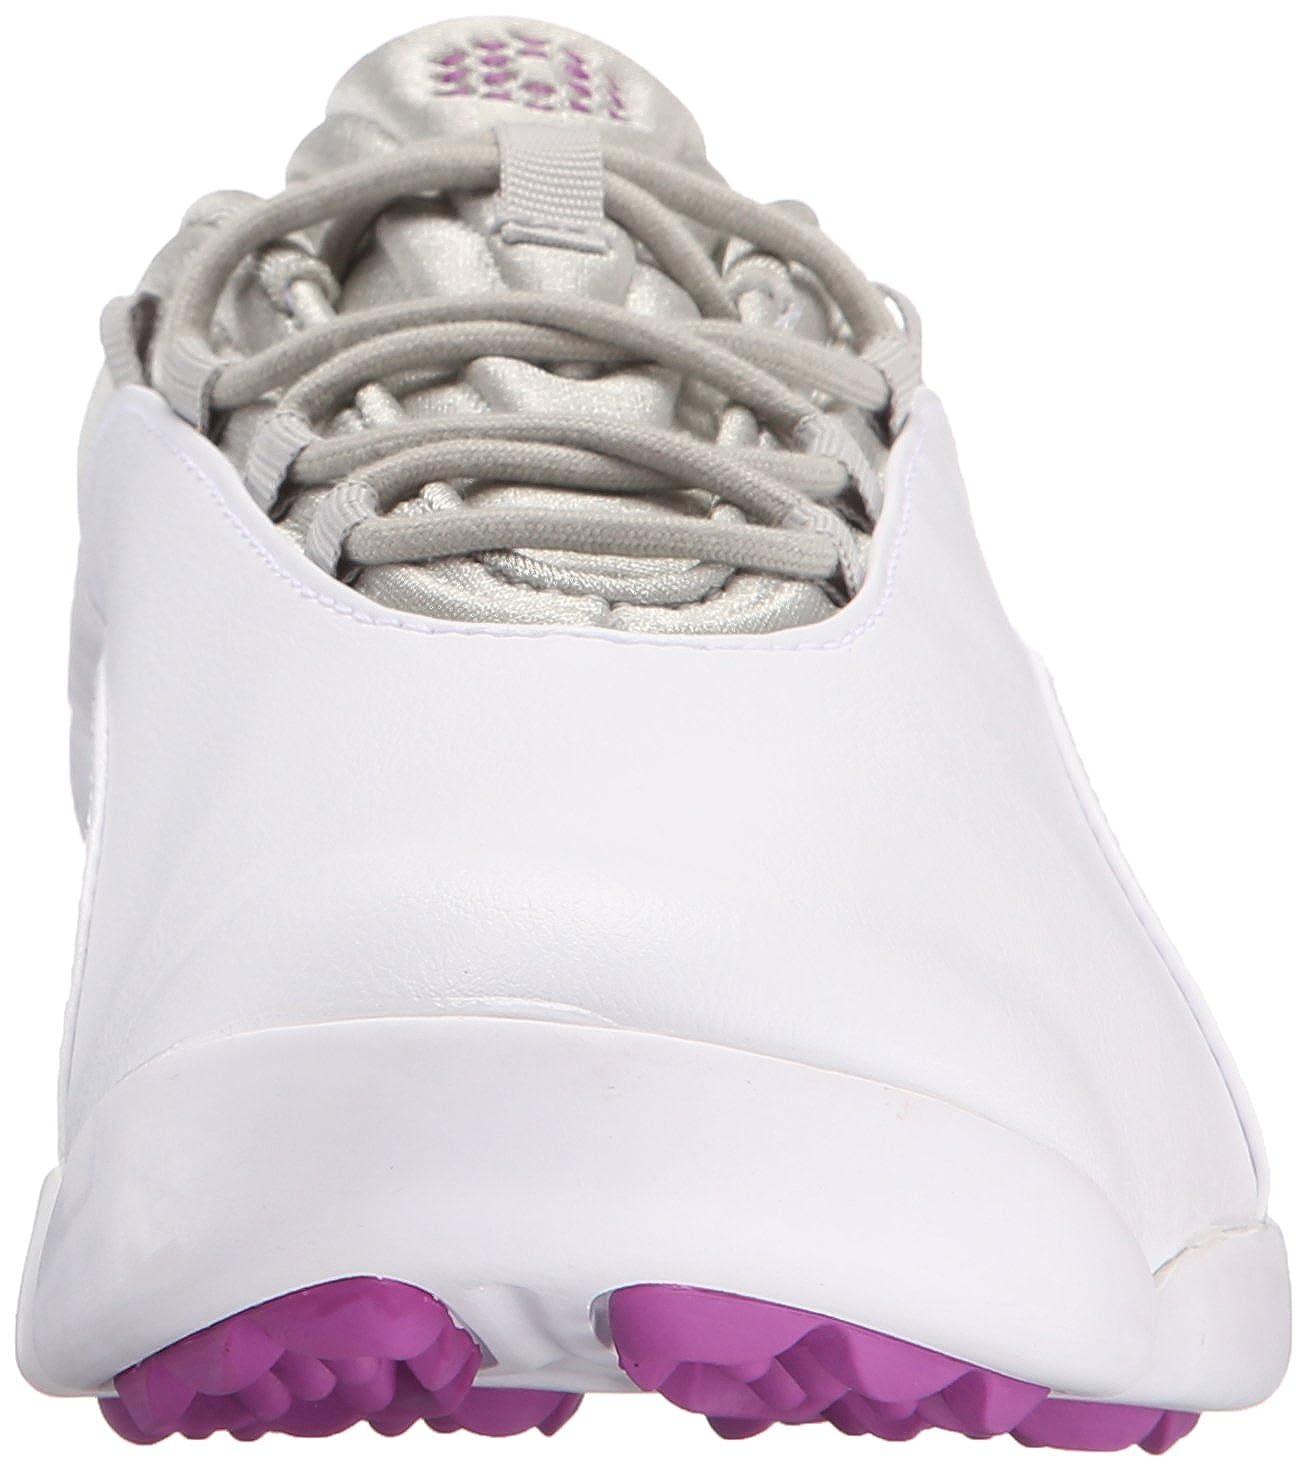 PUMA Sunnylite V2, Zapatos de Golf para Mujer: Amazon.es